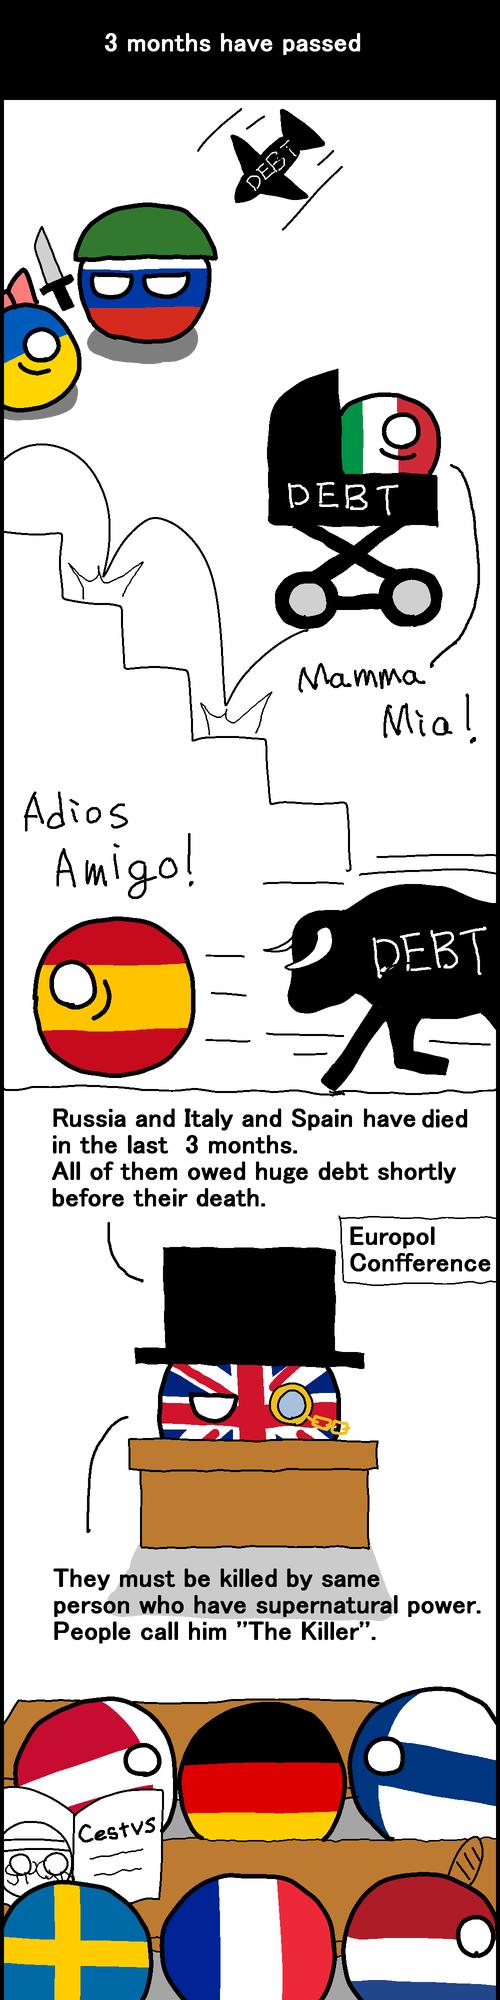 Debt Note